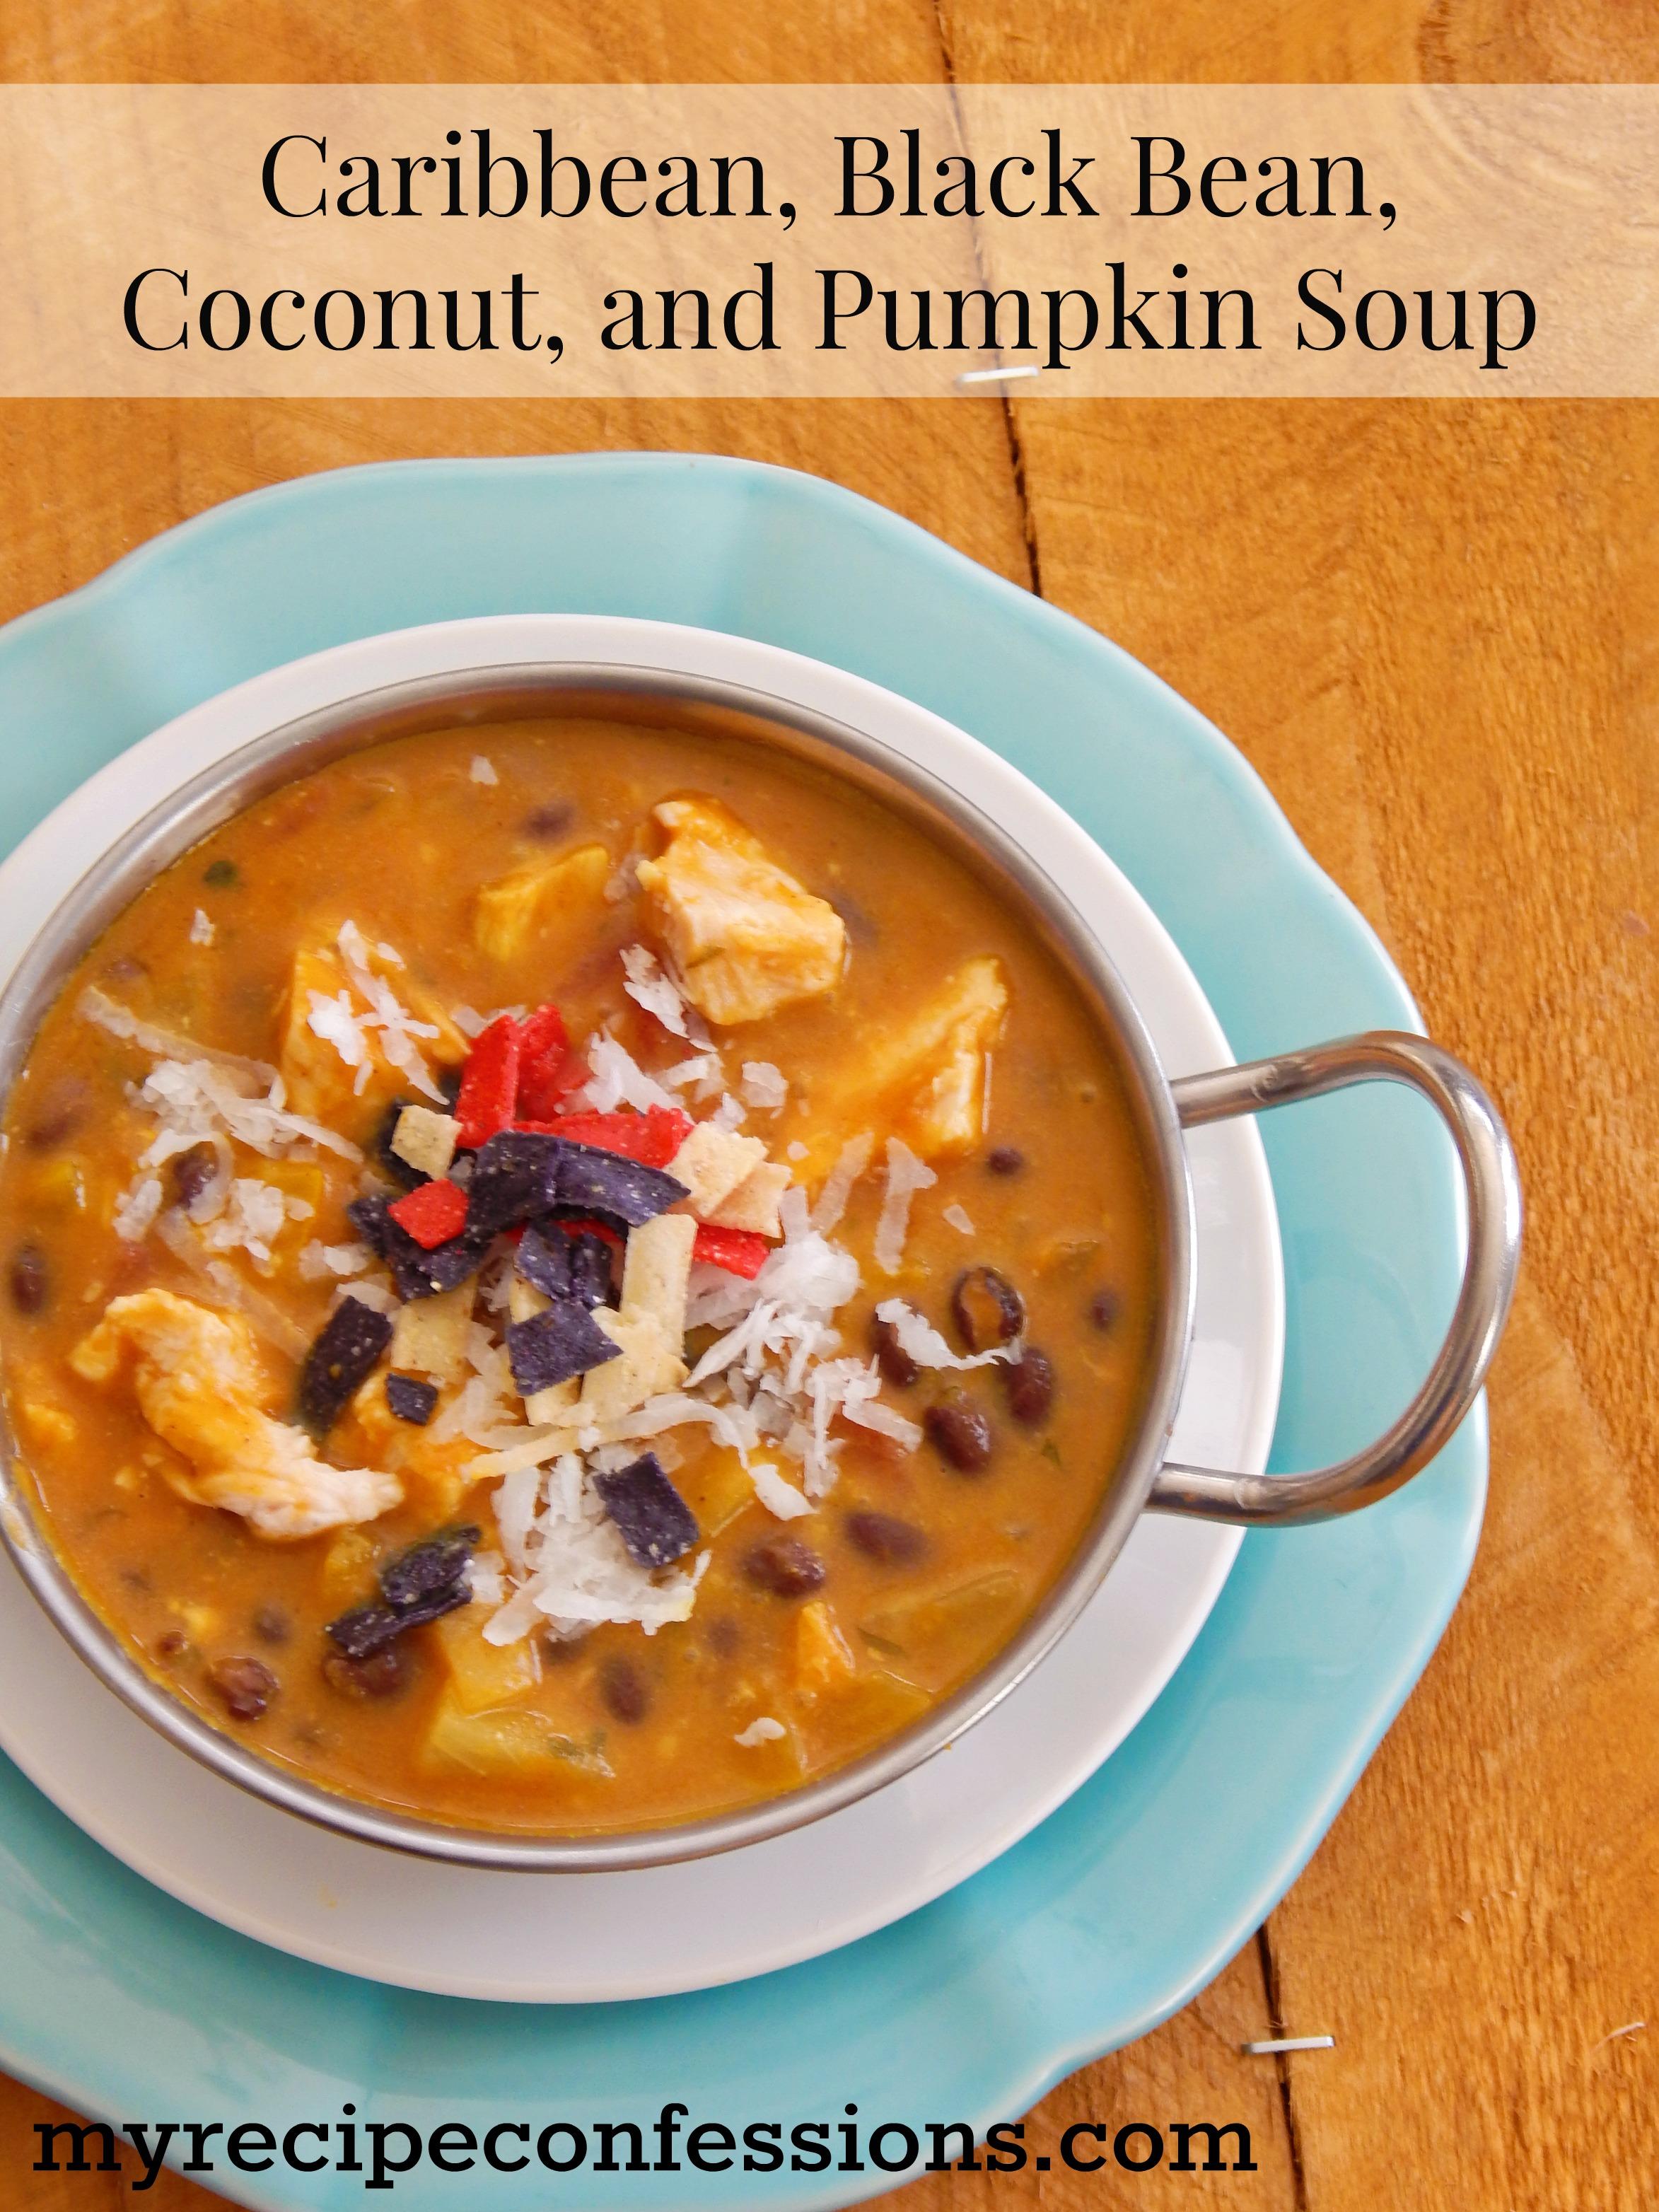 Caribbean Black Bean, Coconut, and Pumpkin Soup | My ...